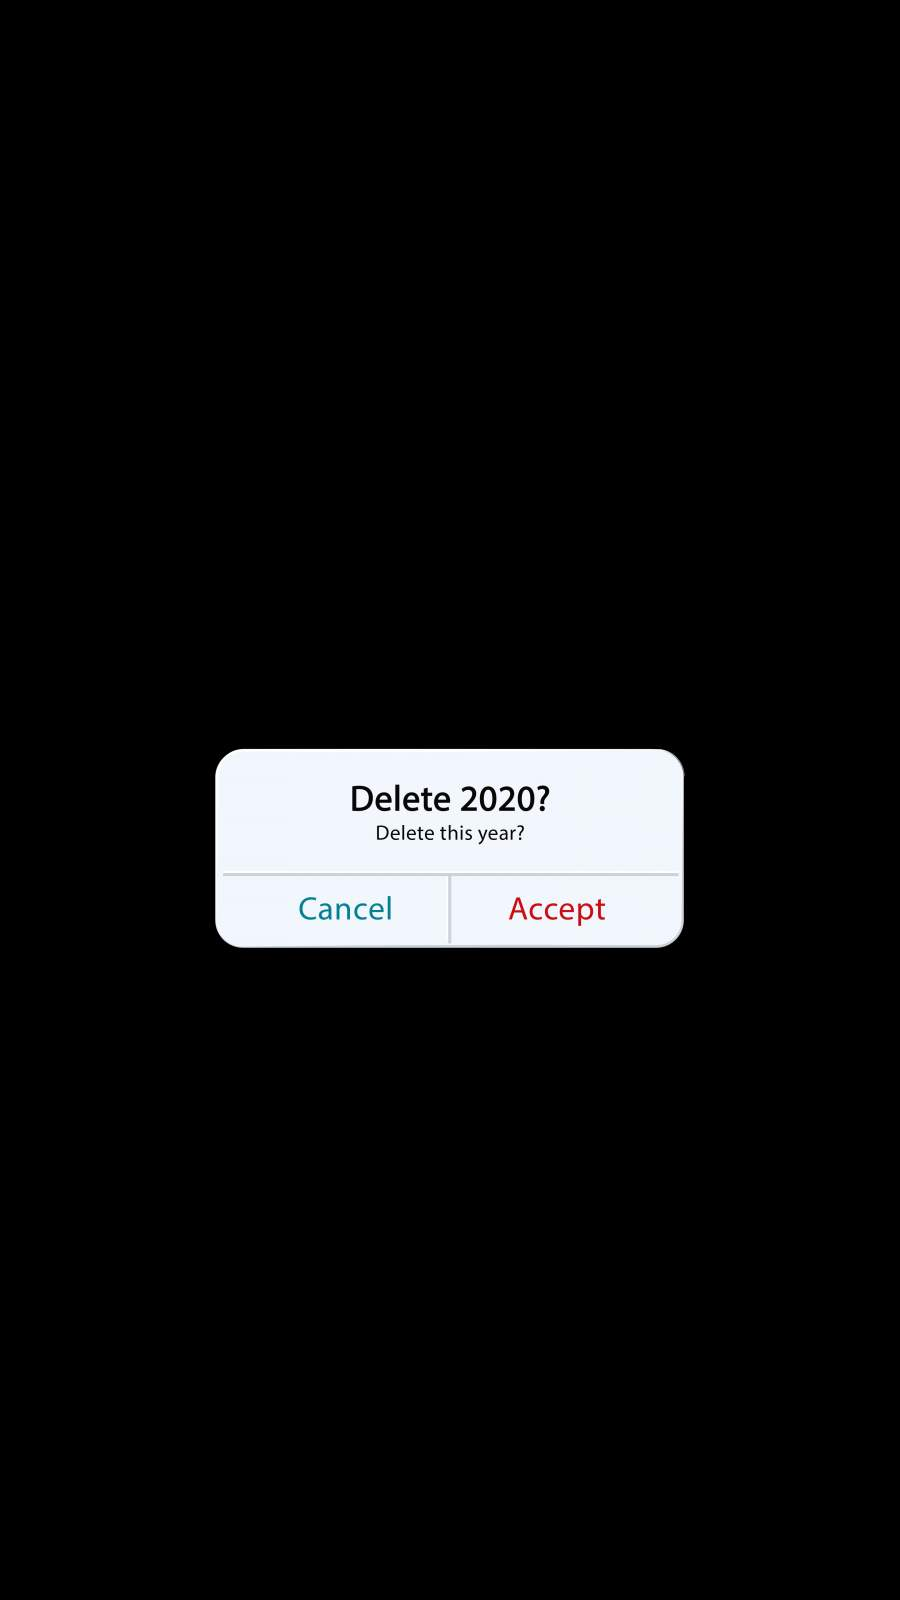 Delete 2020 Year